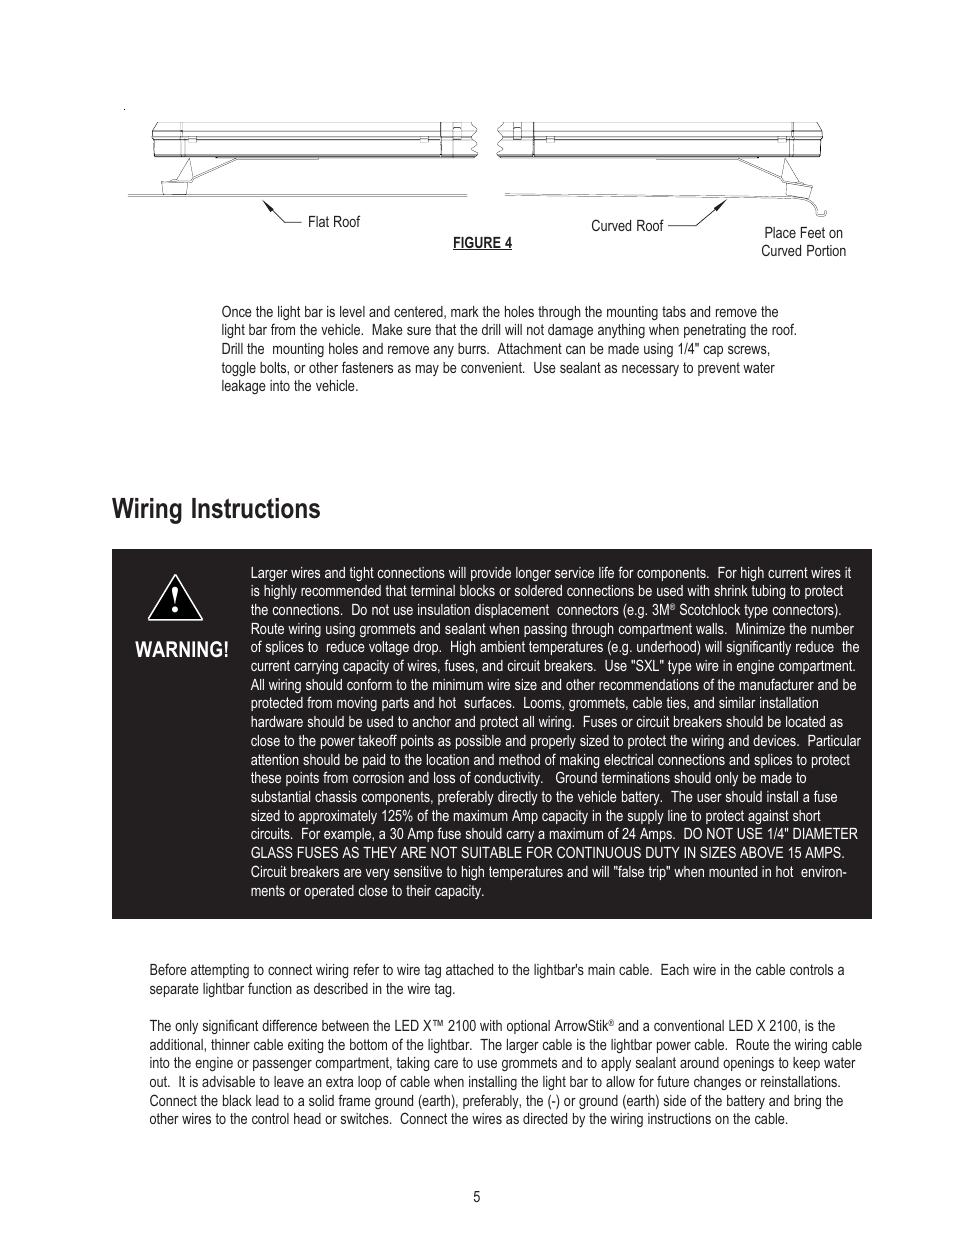 wiring instructions warning code 3 2100 user manual. Black Bedroom Furniture Sets. Home Design Ideas